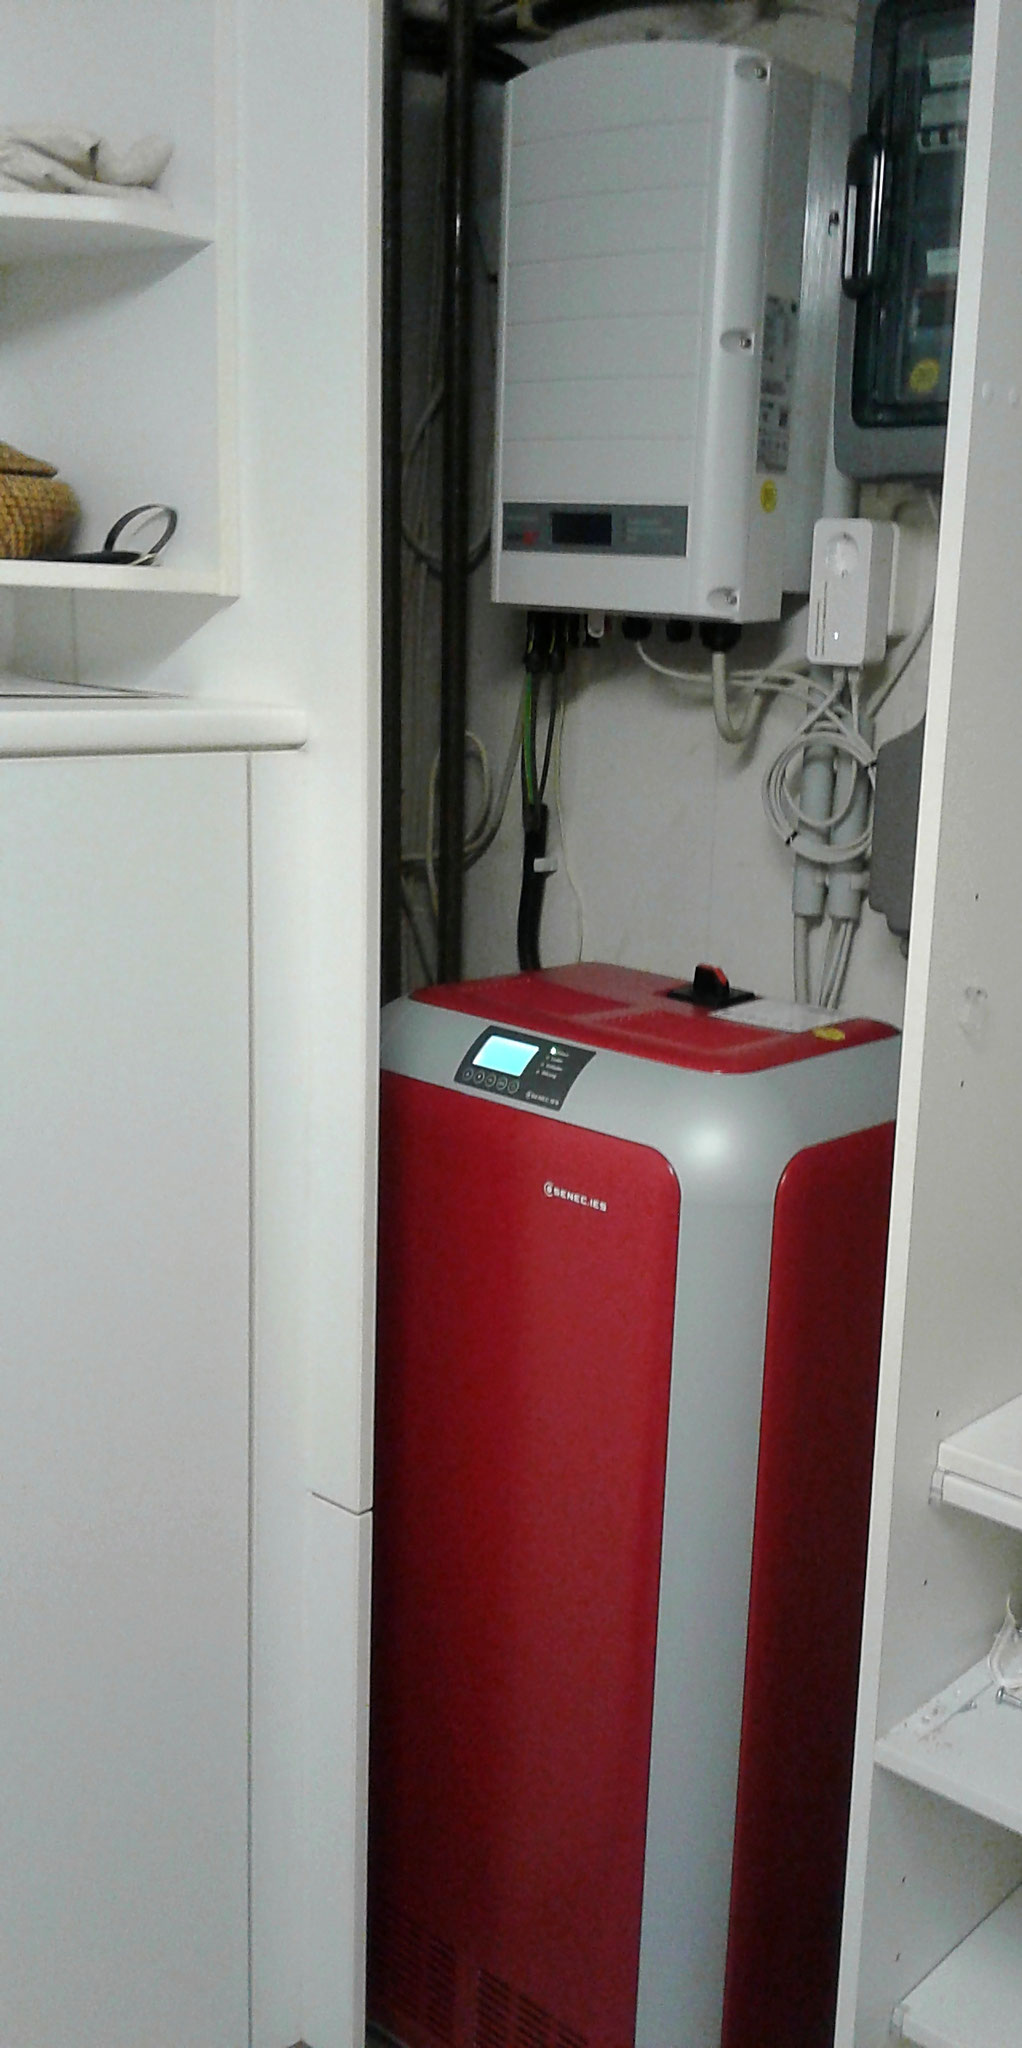 7,5 kW Li Senec Speicher inkl. Senec.Cloud 2.0 in Kombination mit einer Sunpower PV-Anlage in Berlin Rudow